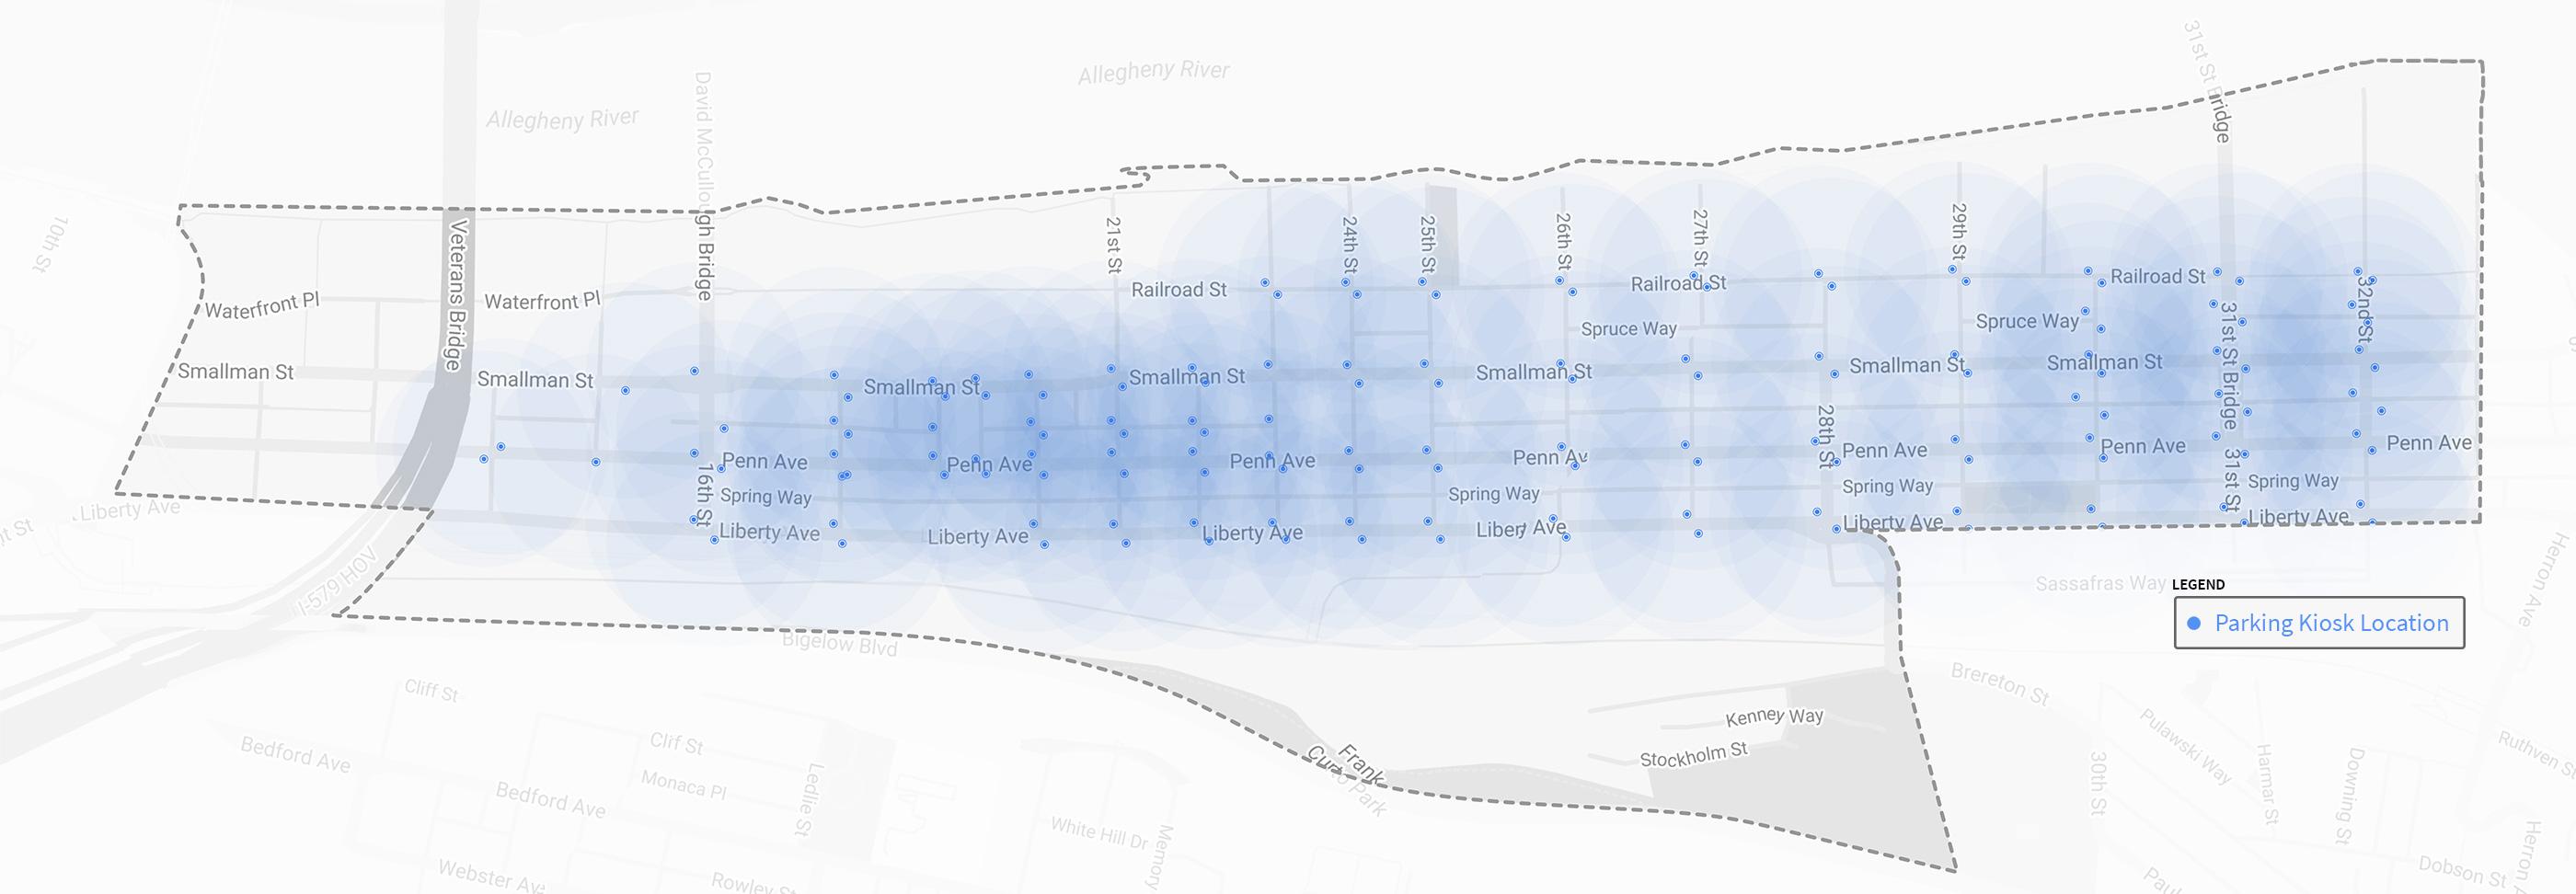 Proposed Parking Heatmap